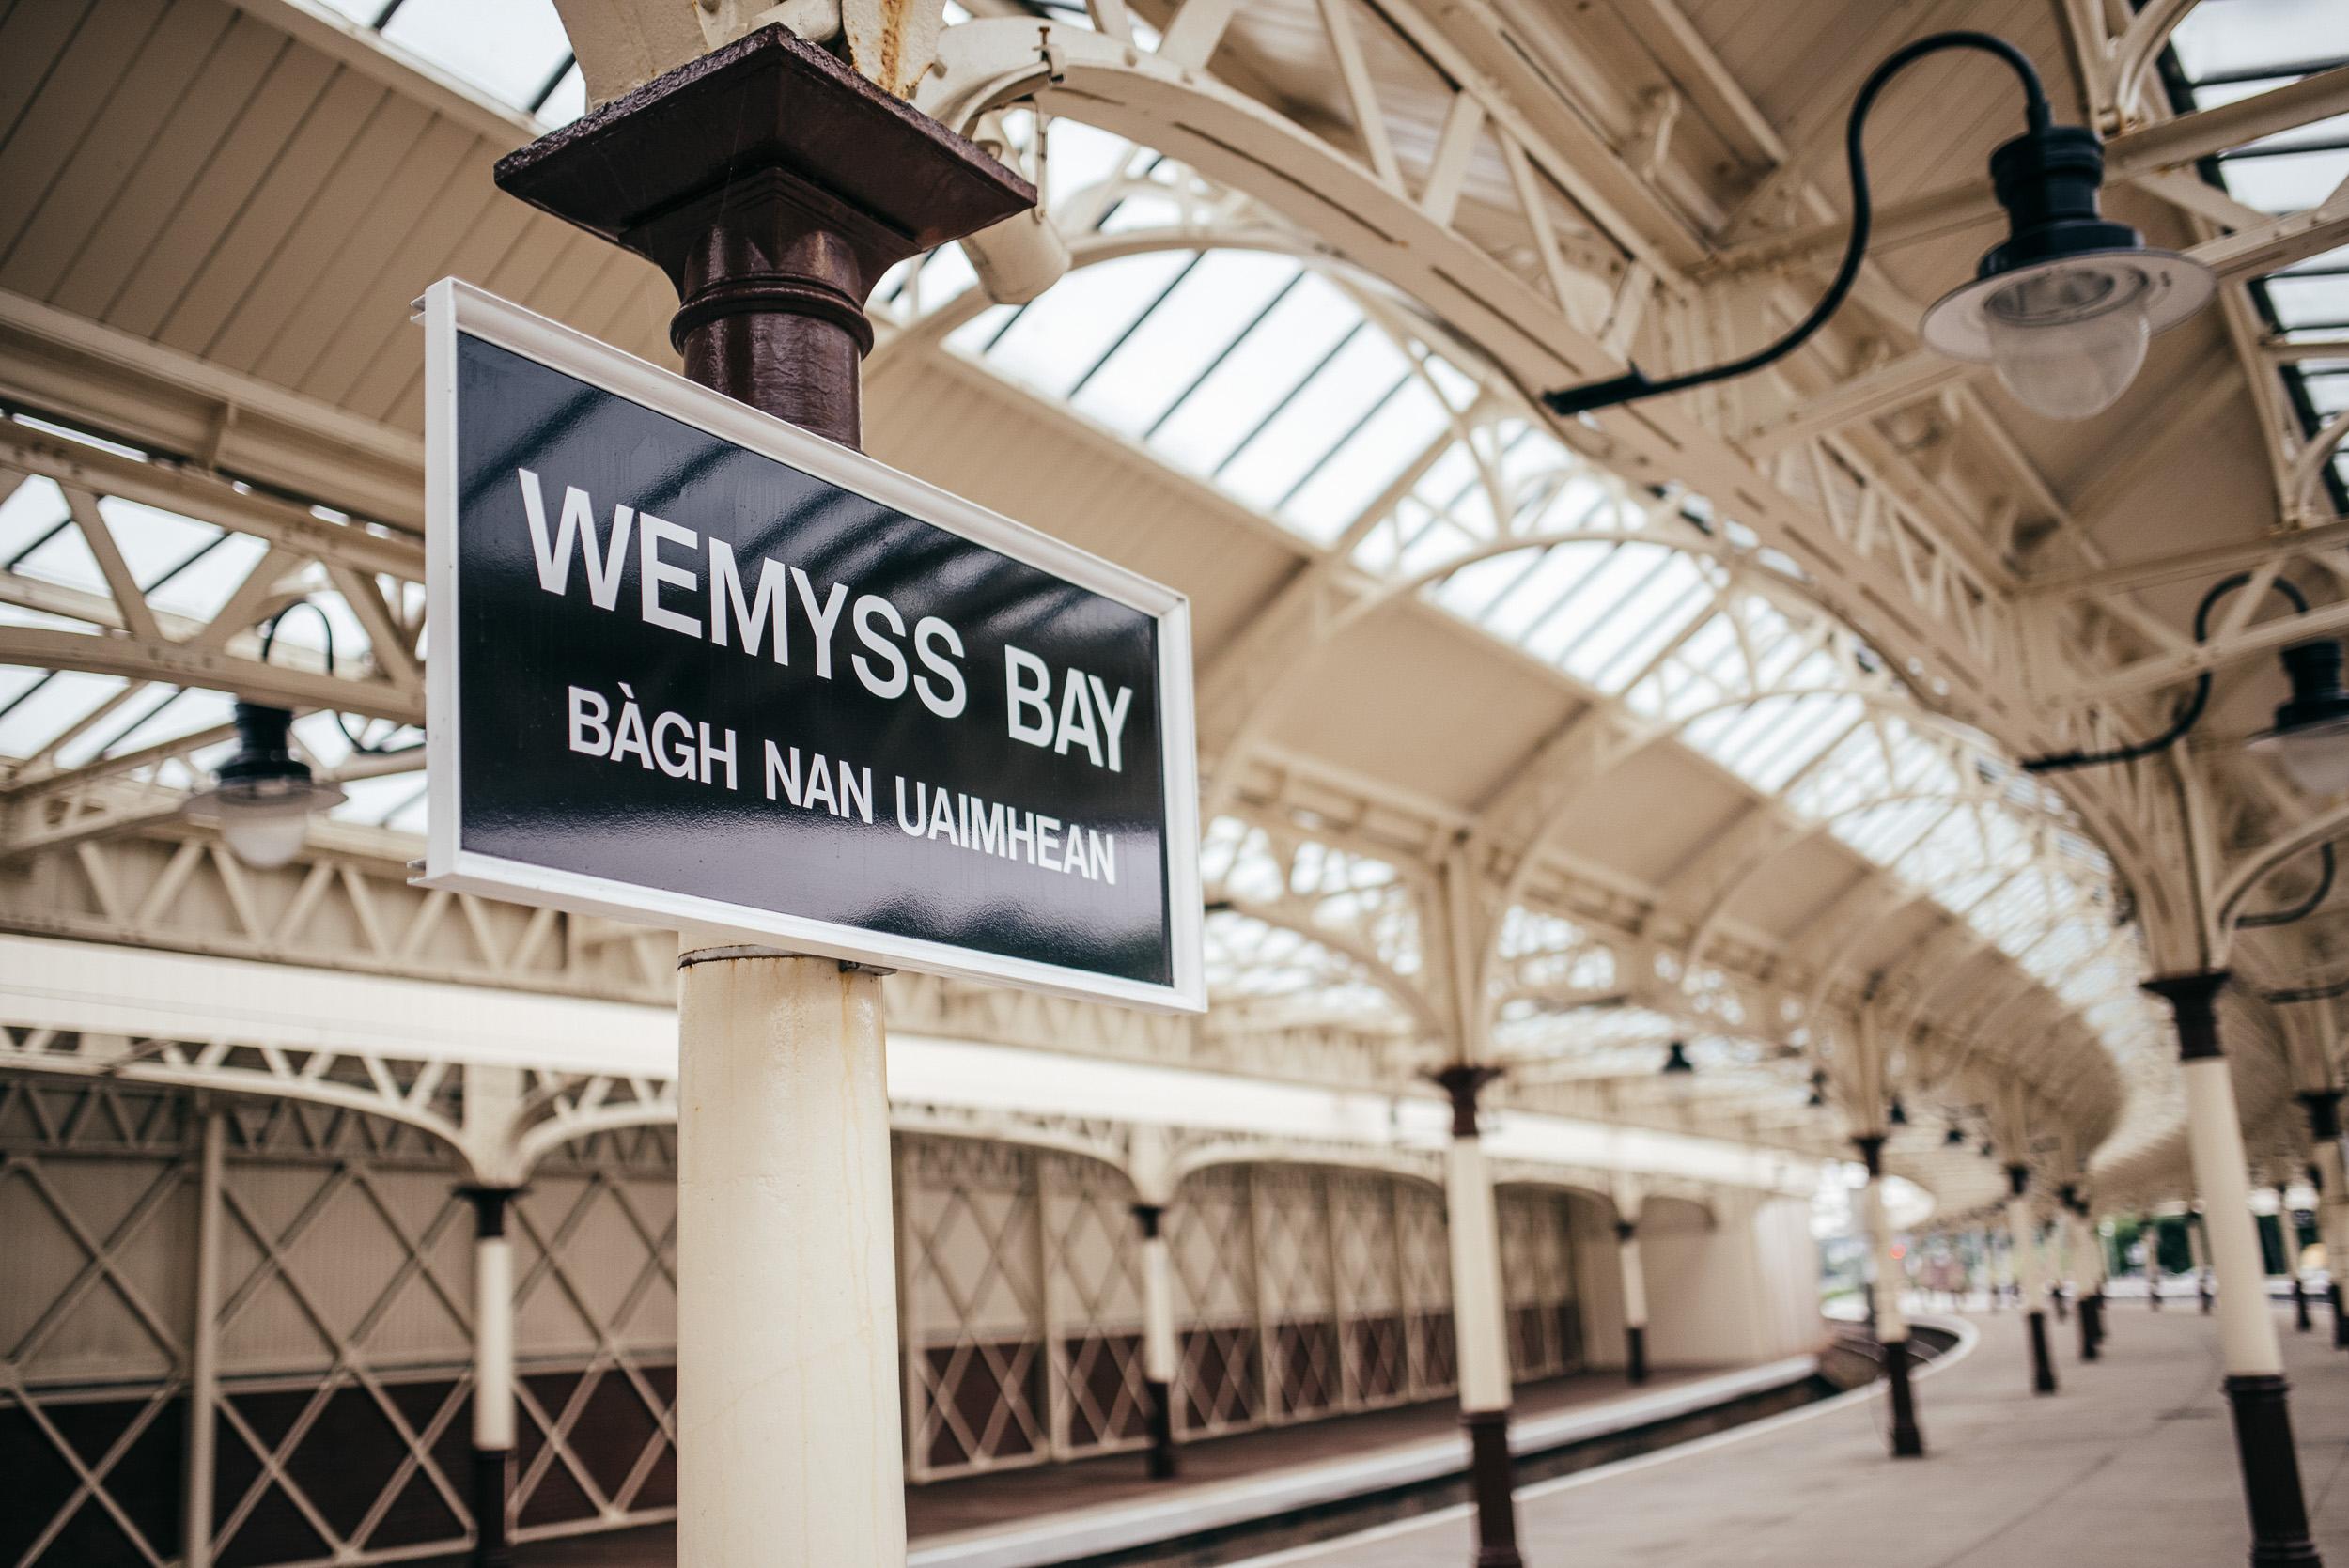 Wemyss Bay Train Station